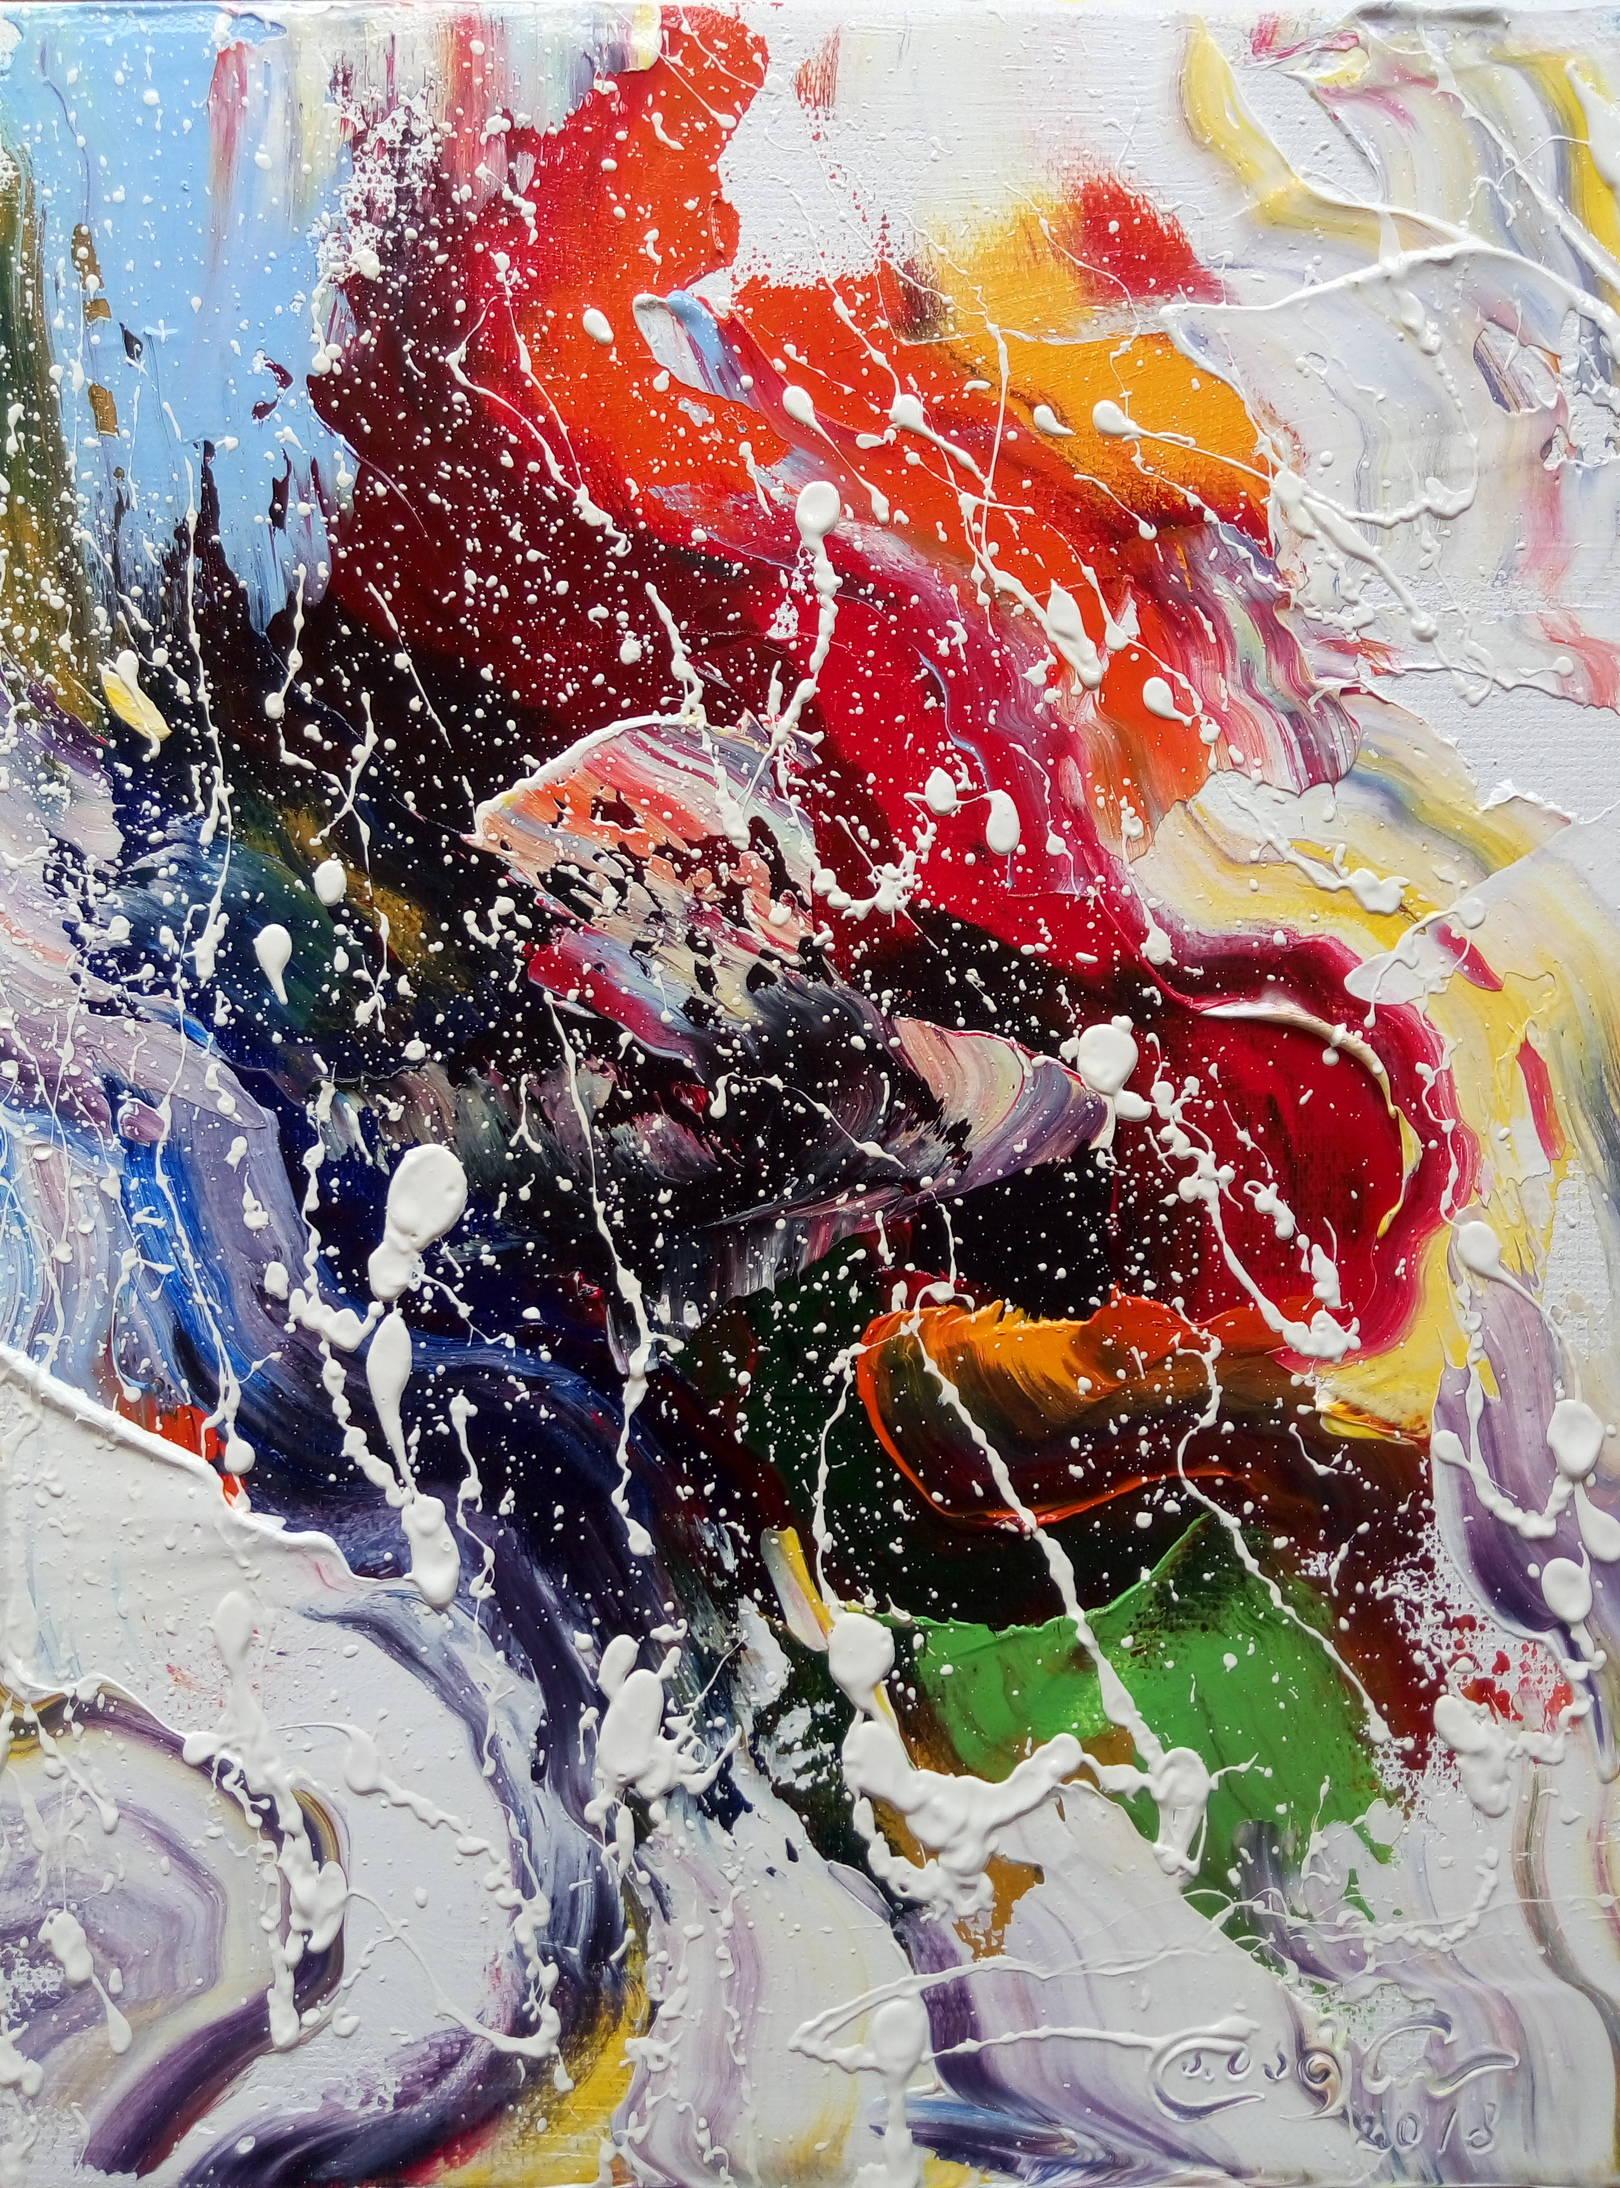 «В подводном царстве»            холст, масло «წყალქვეშა სამეფოში»           oil on canvas                                                      30x24,  2018